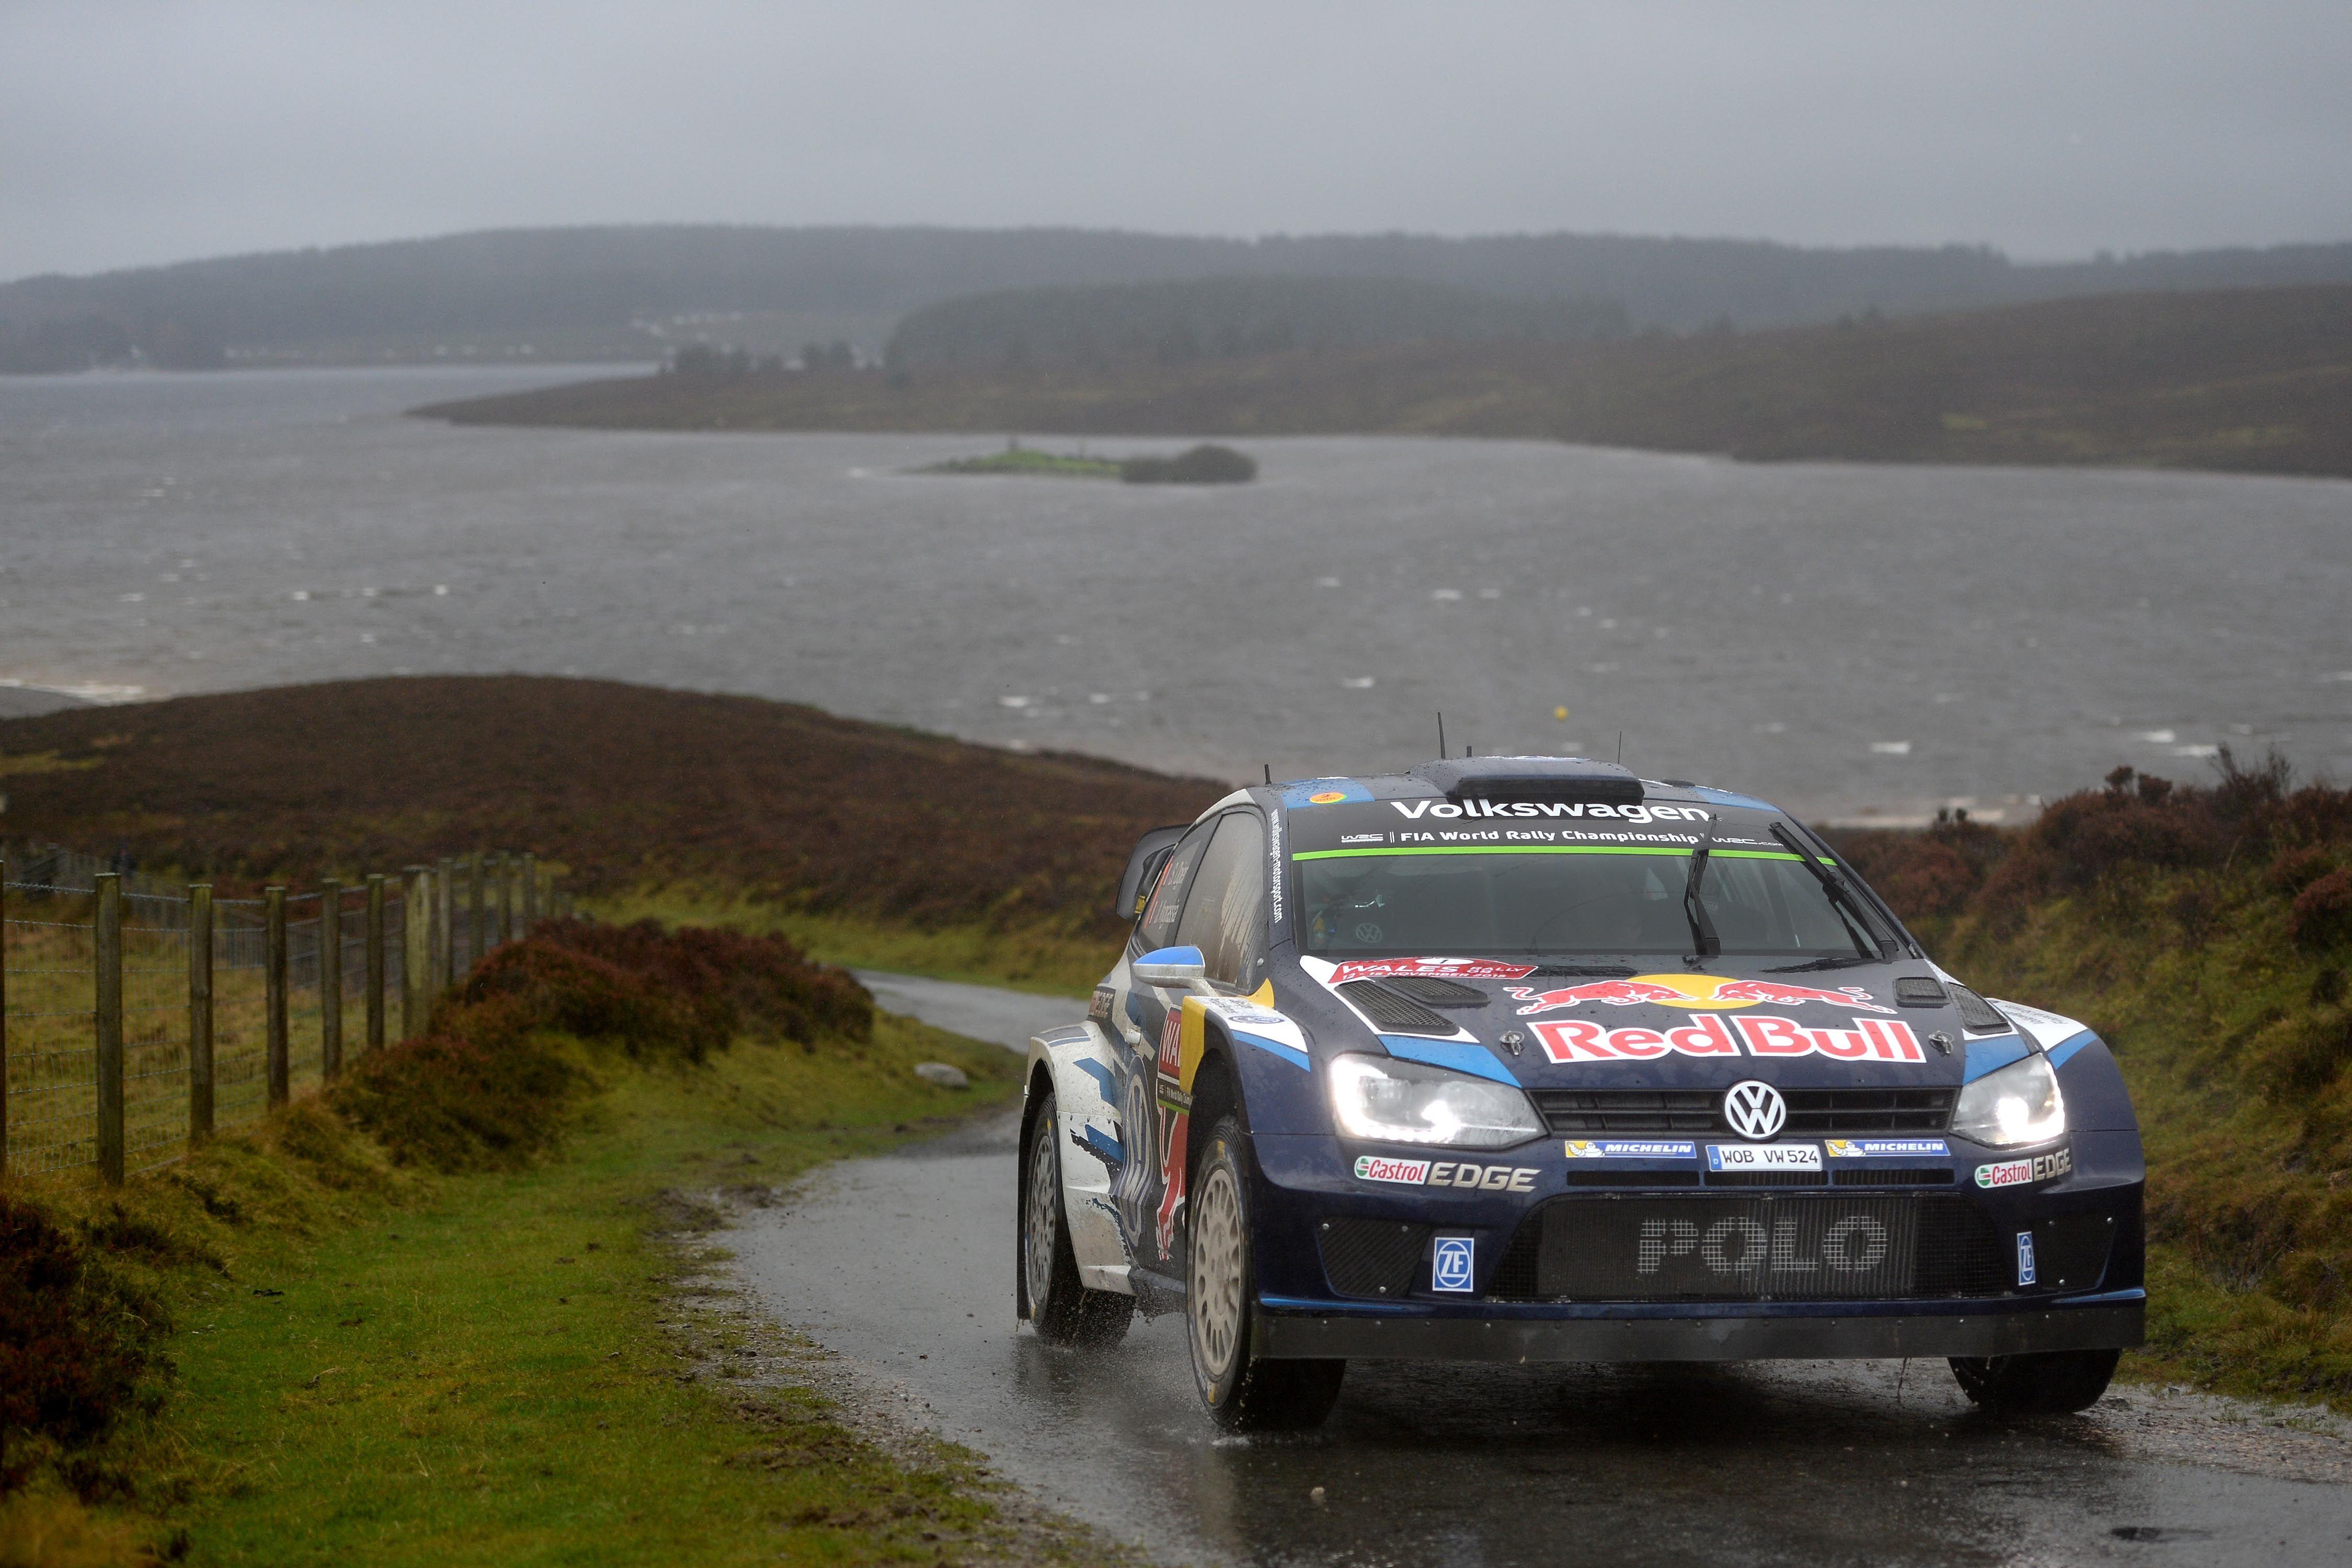 WRC - 2015 Wales Rally GB